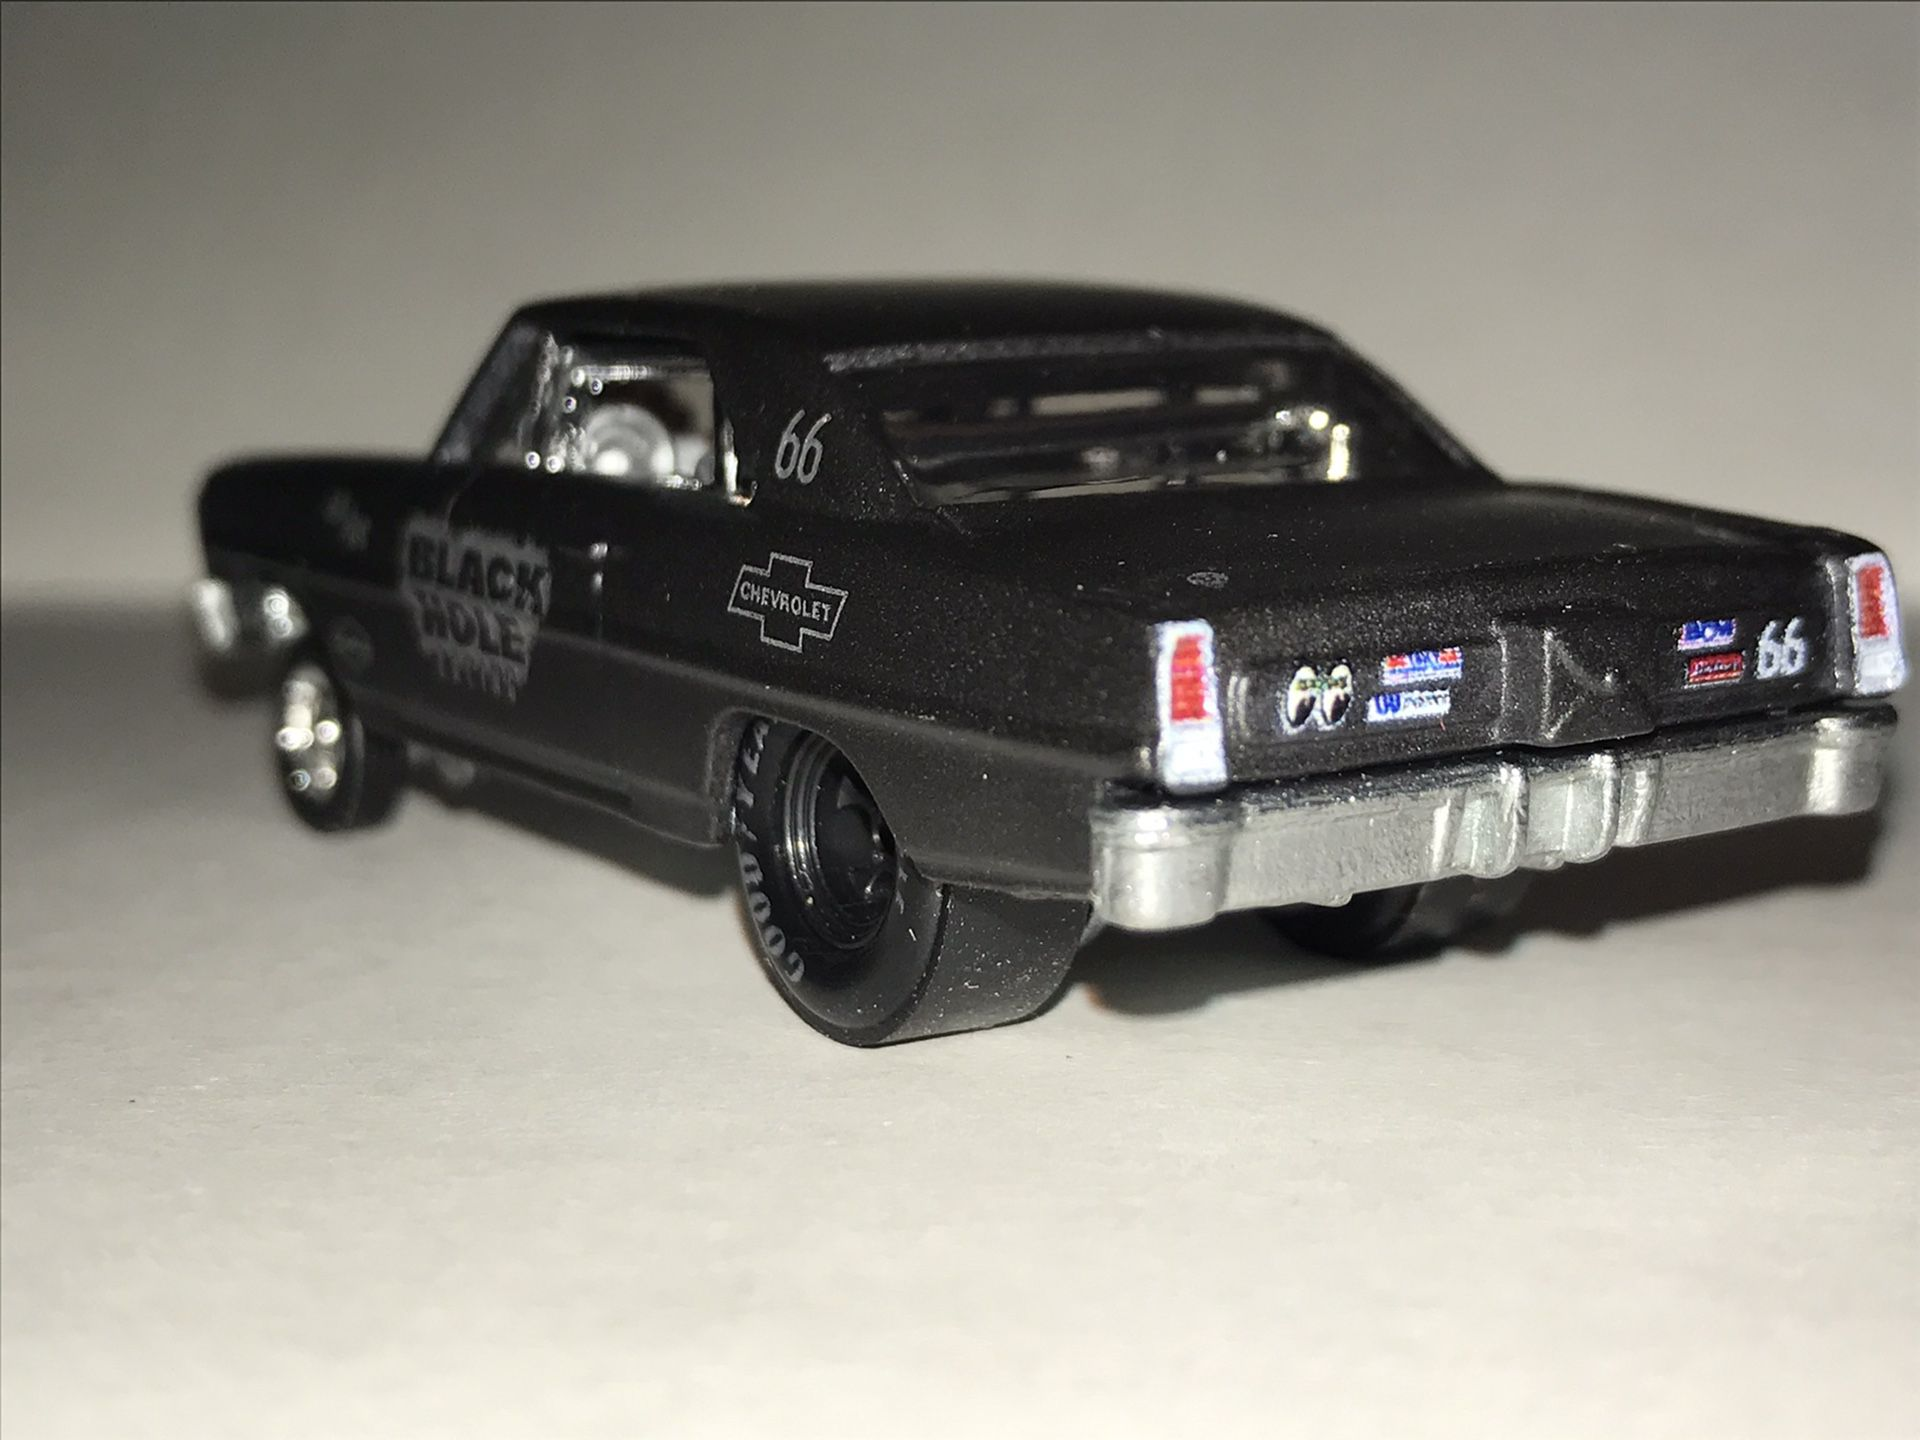 Hot wheels 66 chevy nova